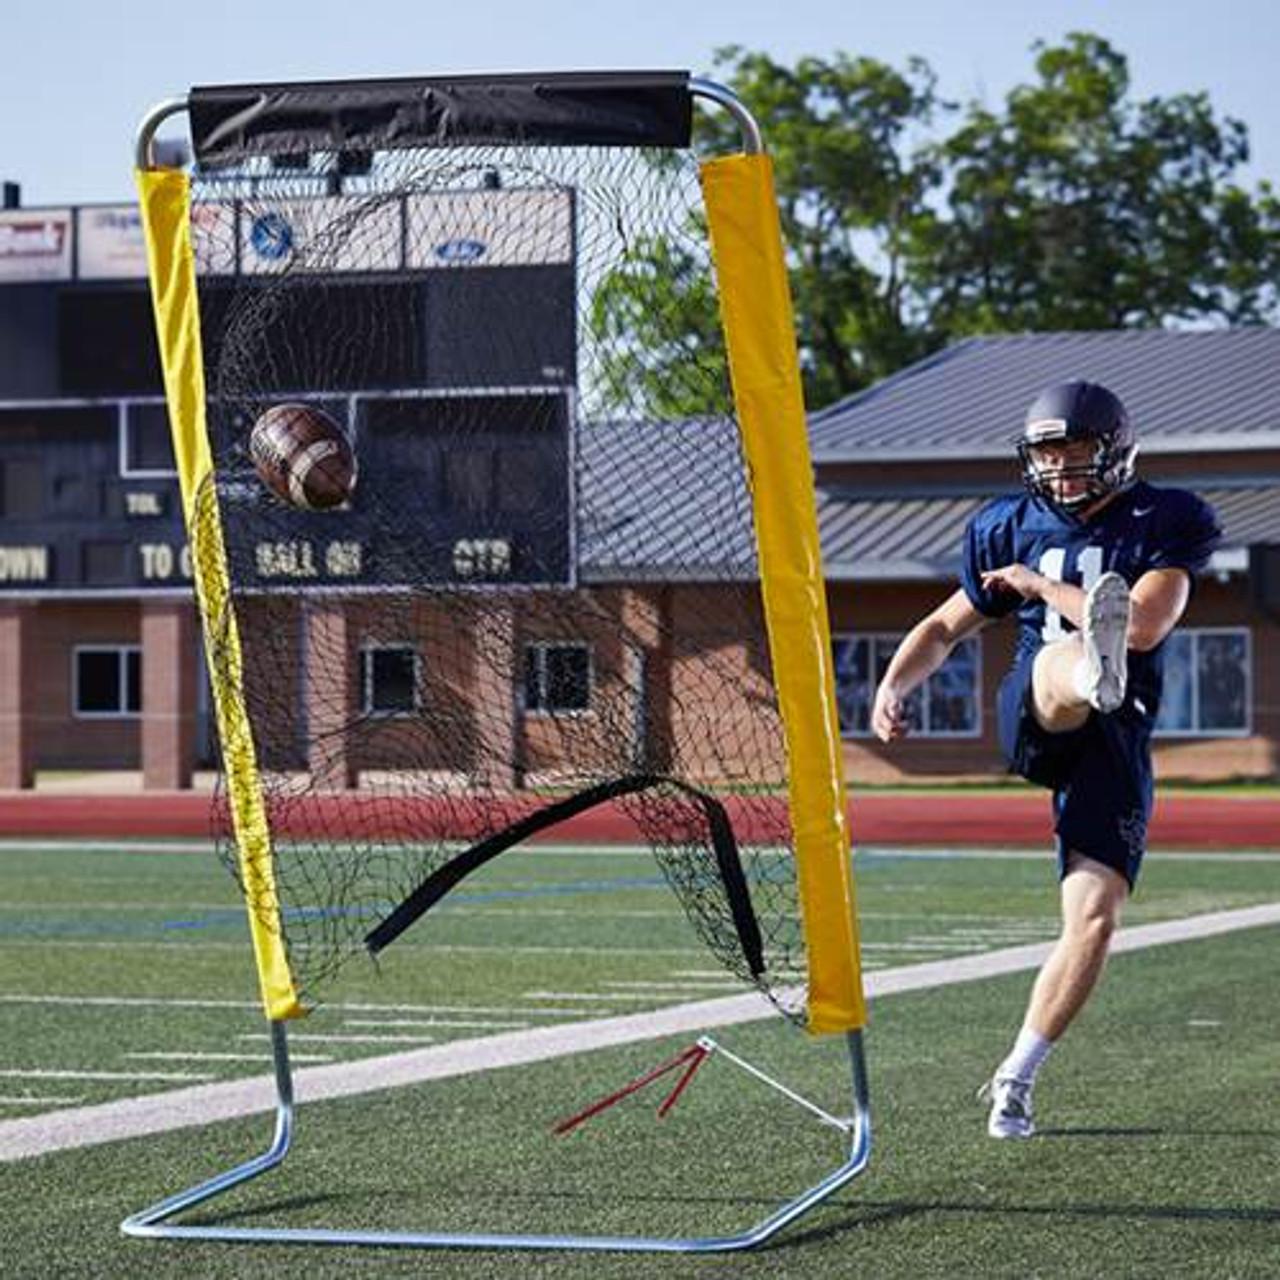 Pro Down Varsity Football Kicking Cage